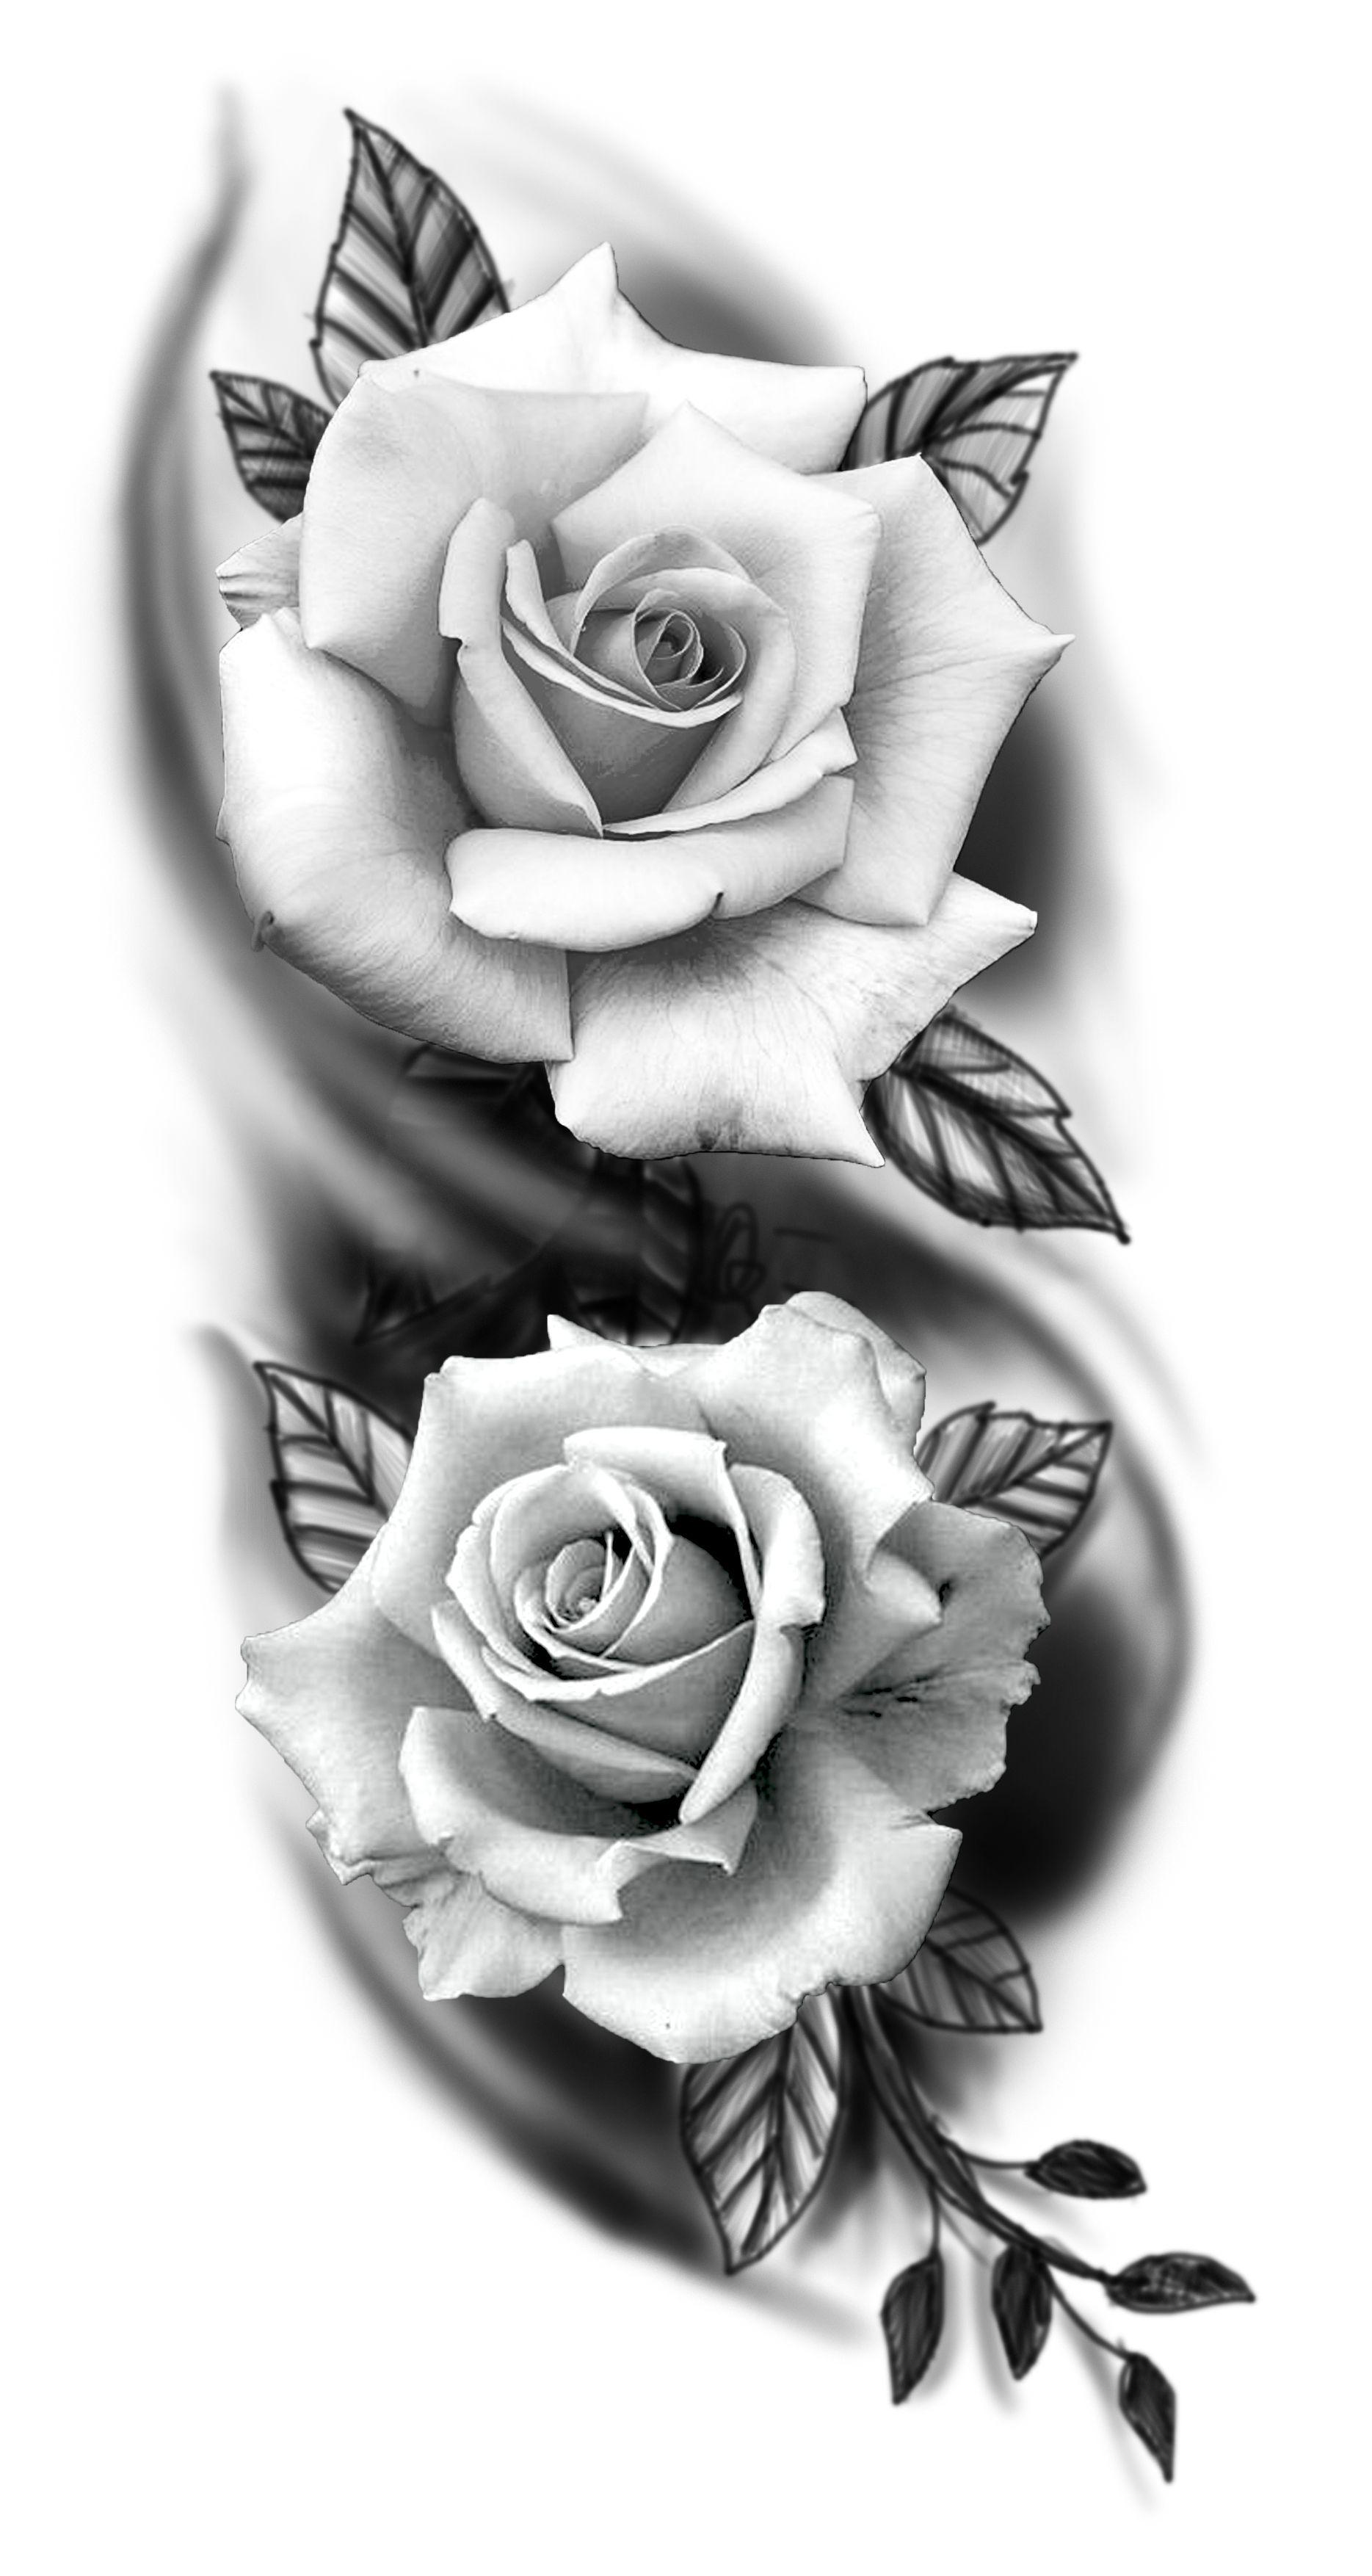 Pin By Kris On Projekty 2019 Rose Tattoos For Men Realistic Rose Tattoo Rose Tattoos For Women